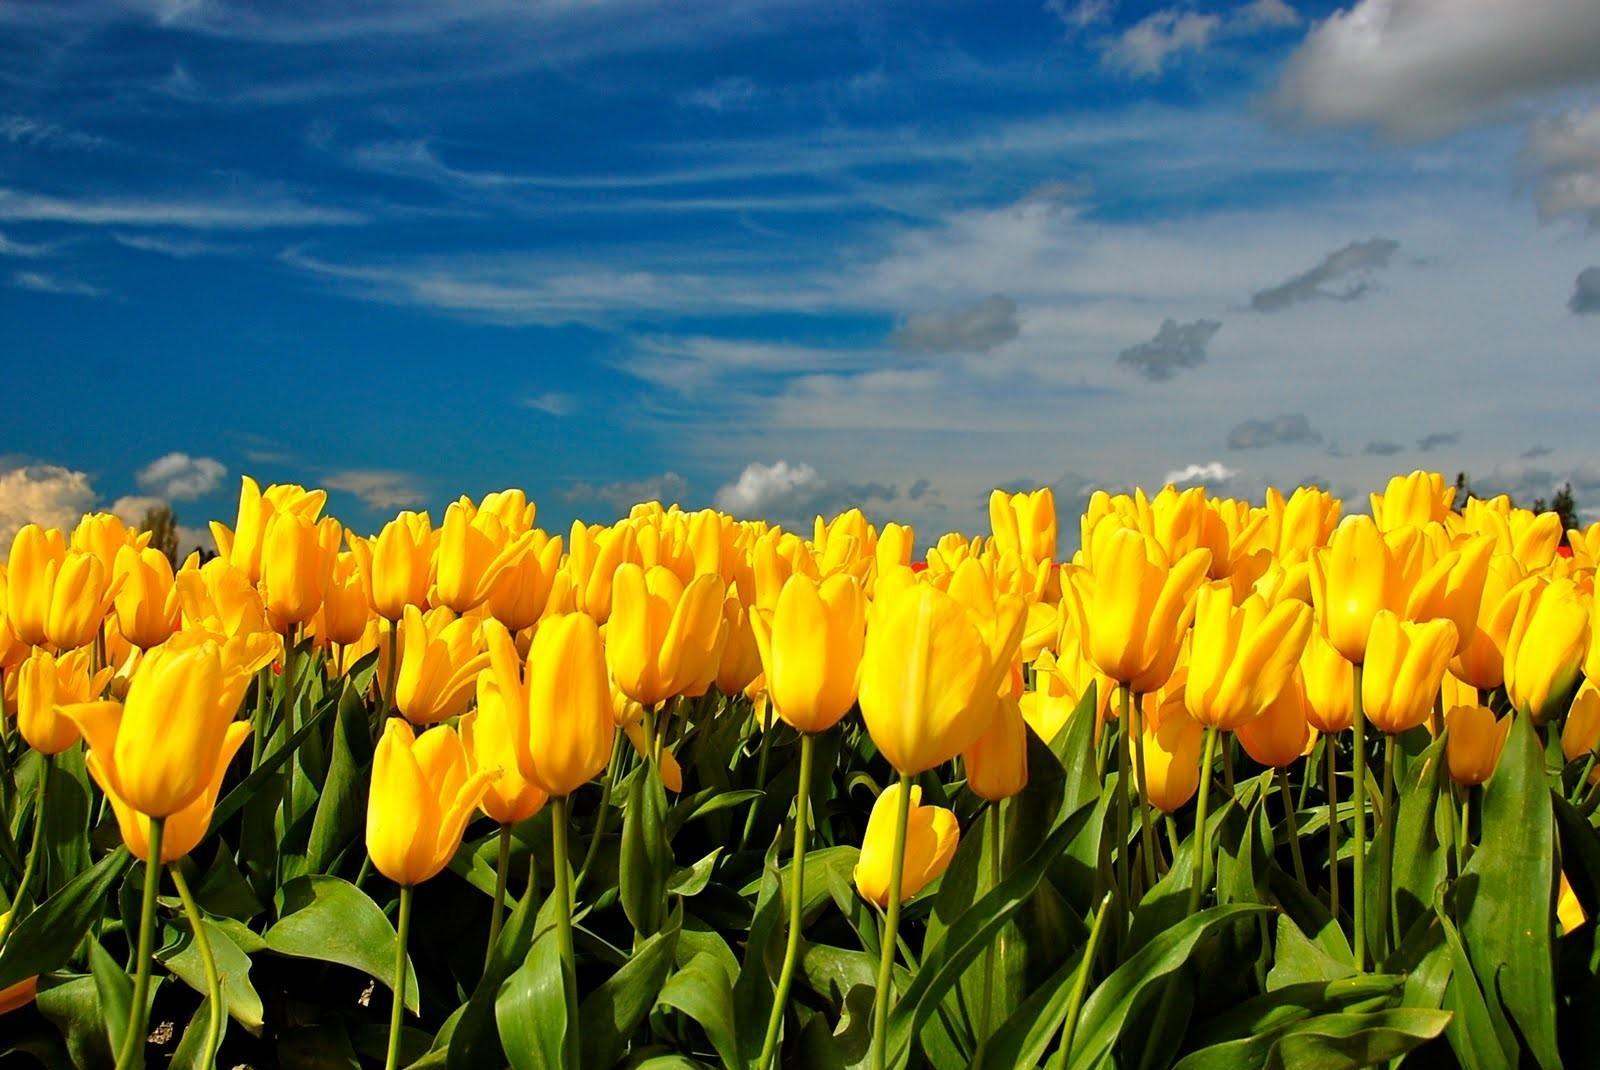 139840 descargar fondo de pantalla Flores, Primavera, Cielo, Nubes, Tulipanes: protectores de pantalla e imágenes gratis